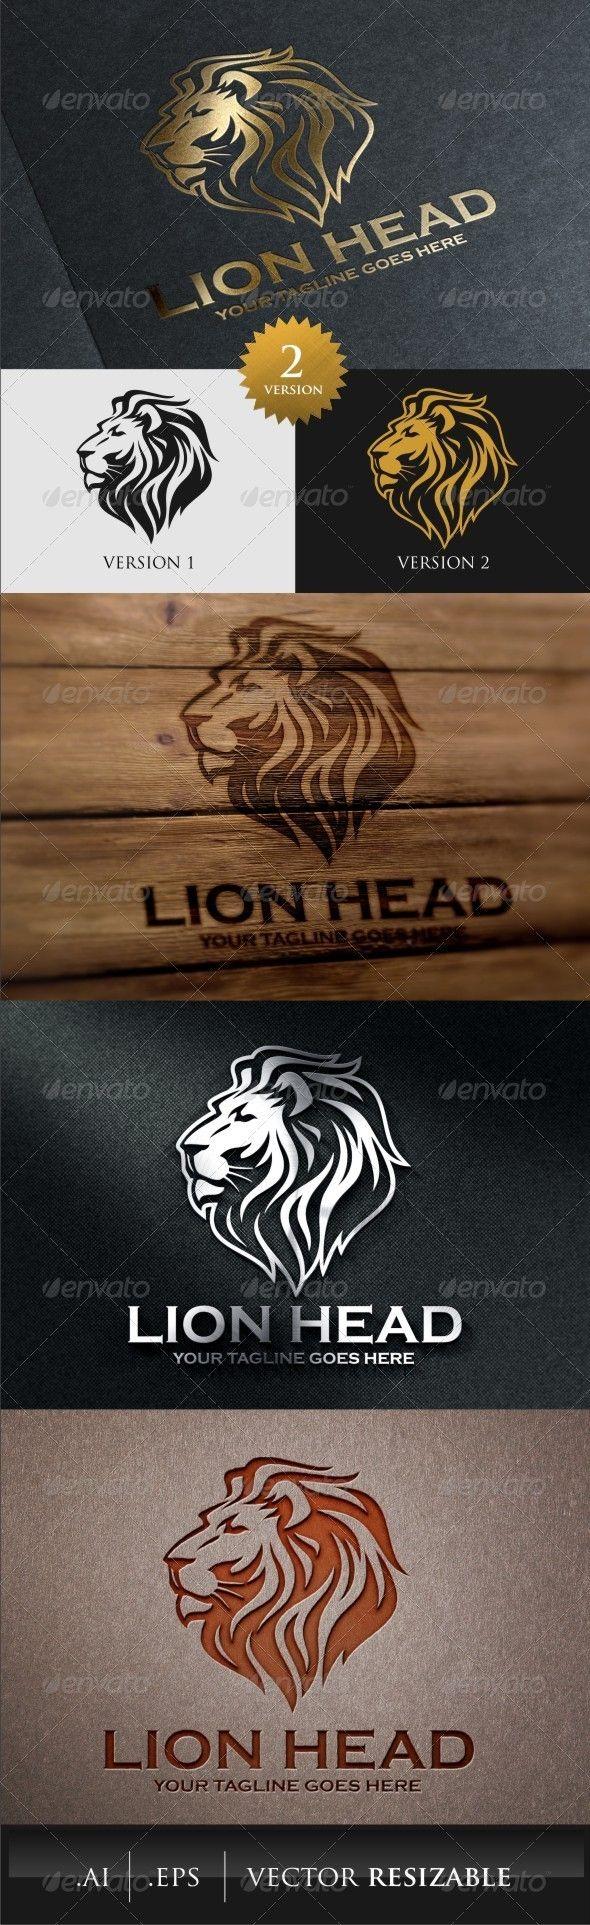 Lion Head Logo Template Vector EPS, AI Illustrator, CorelDRAW CDR. Download here: https://graphicriver.net/item/lion-head-logo-template/7871118?ref=ksioks